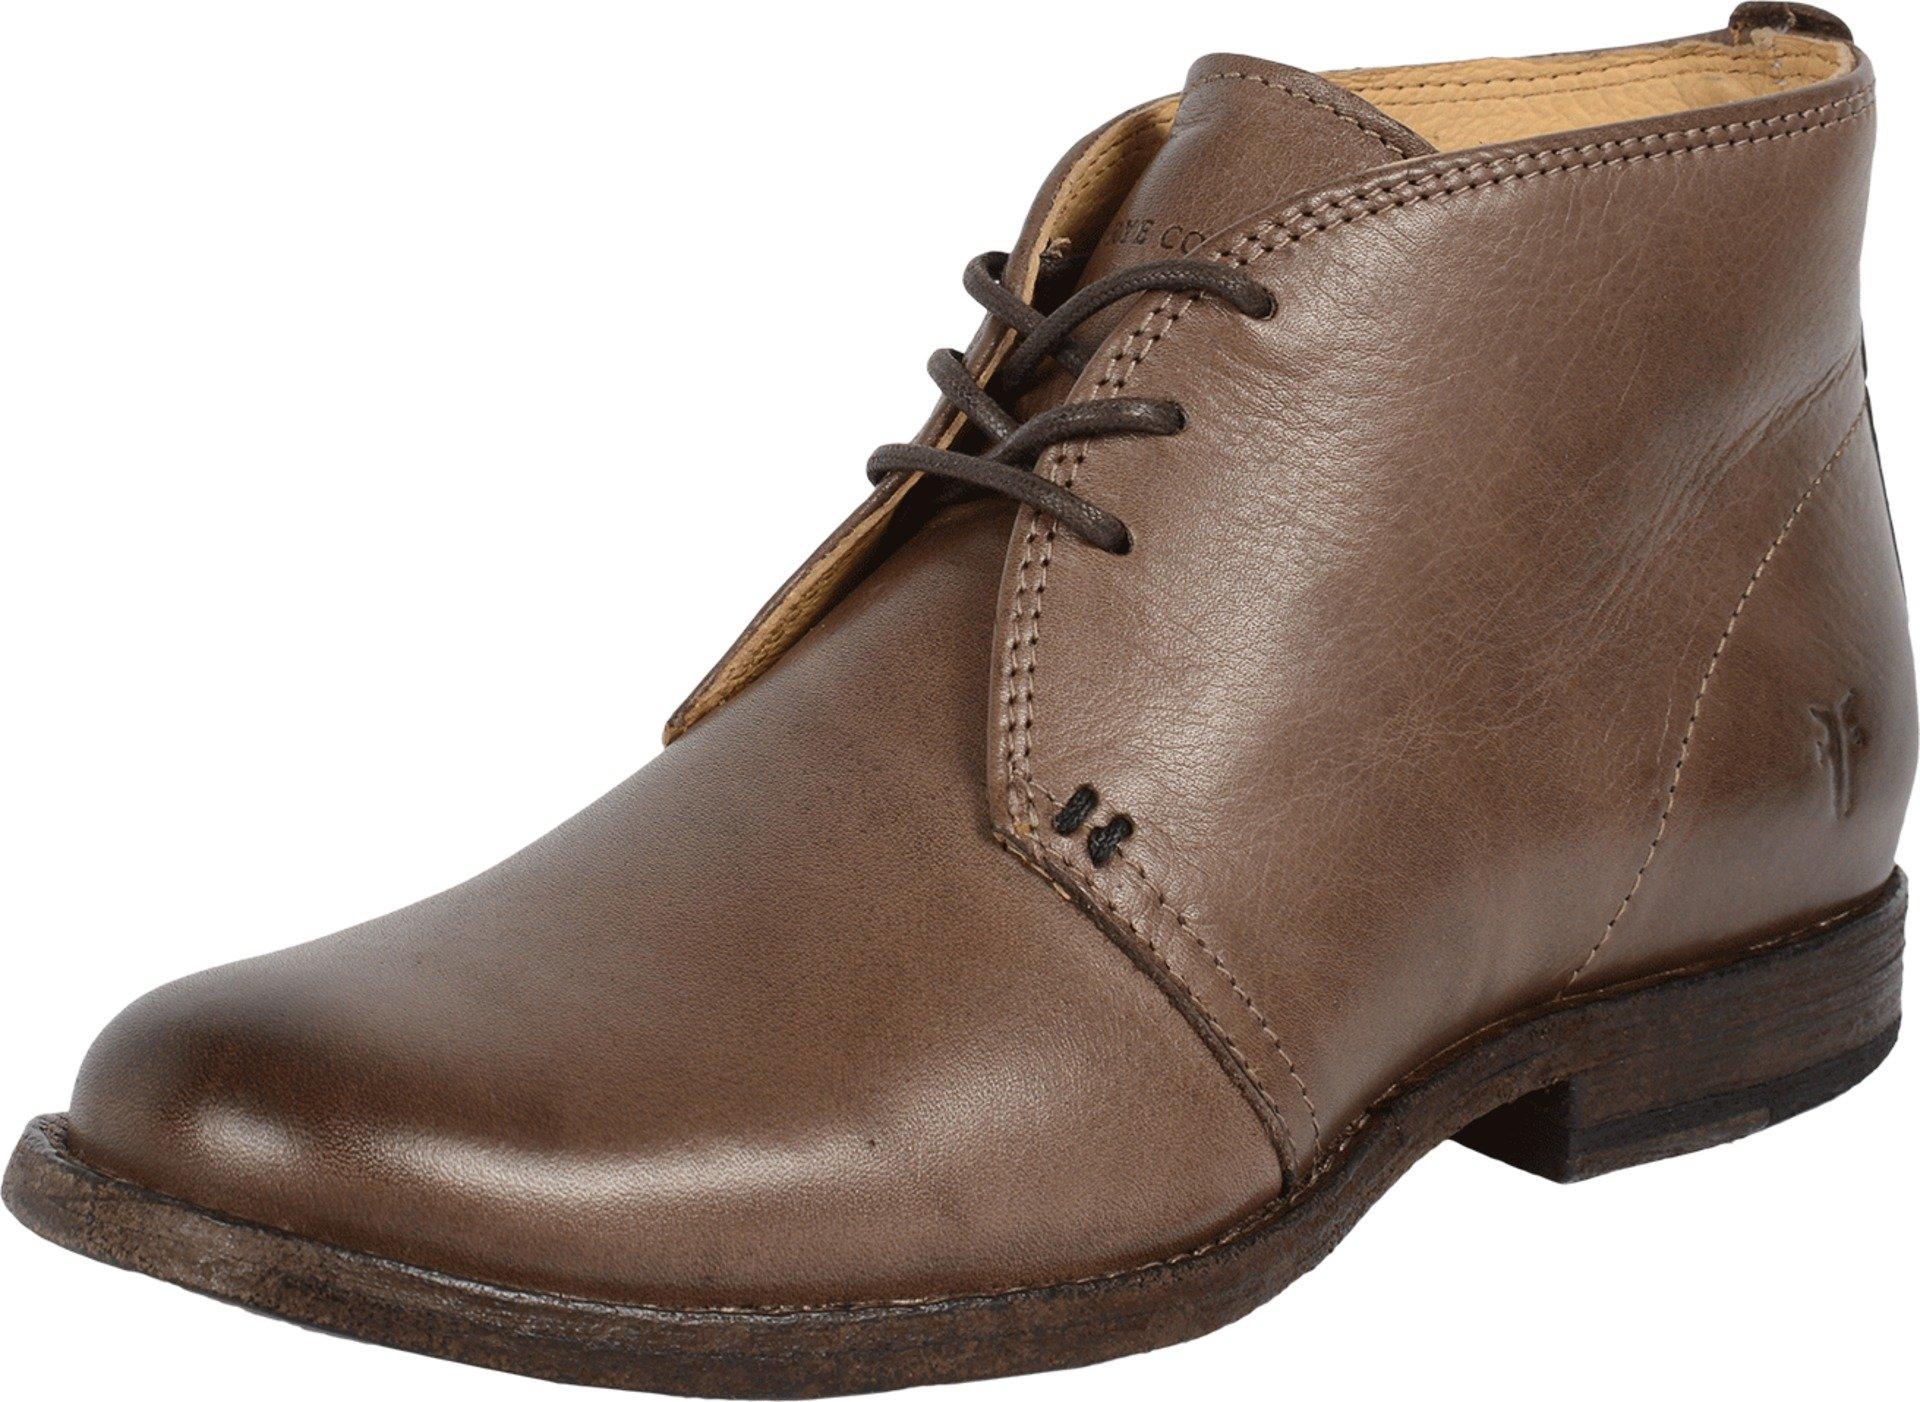 FRYE Women's Phillip Chukka Grey Soft Vintage Leather Boot 6 B (M)